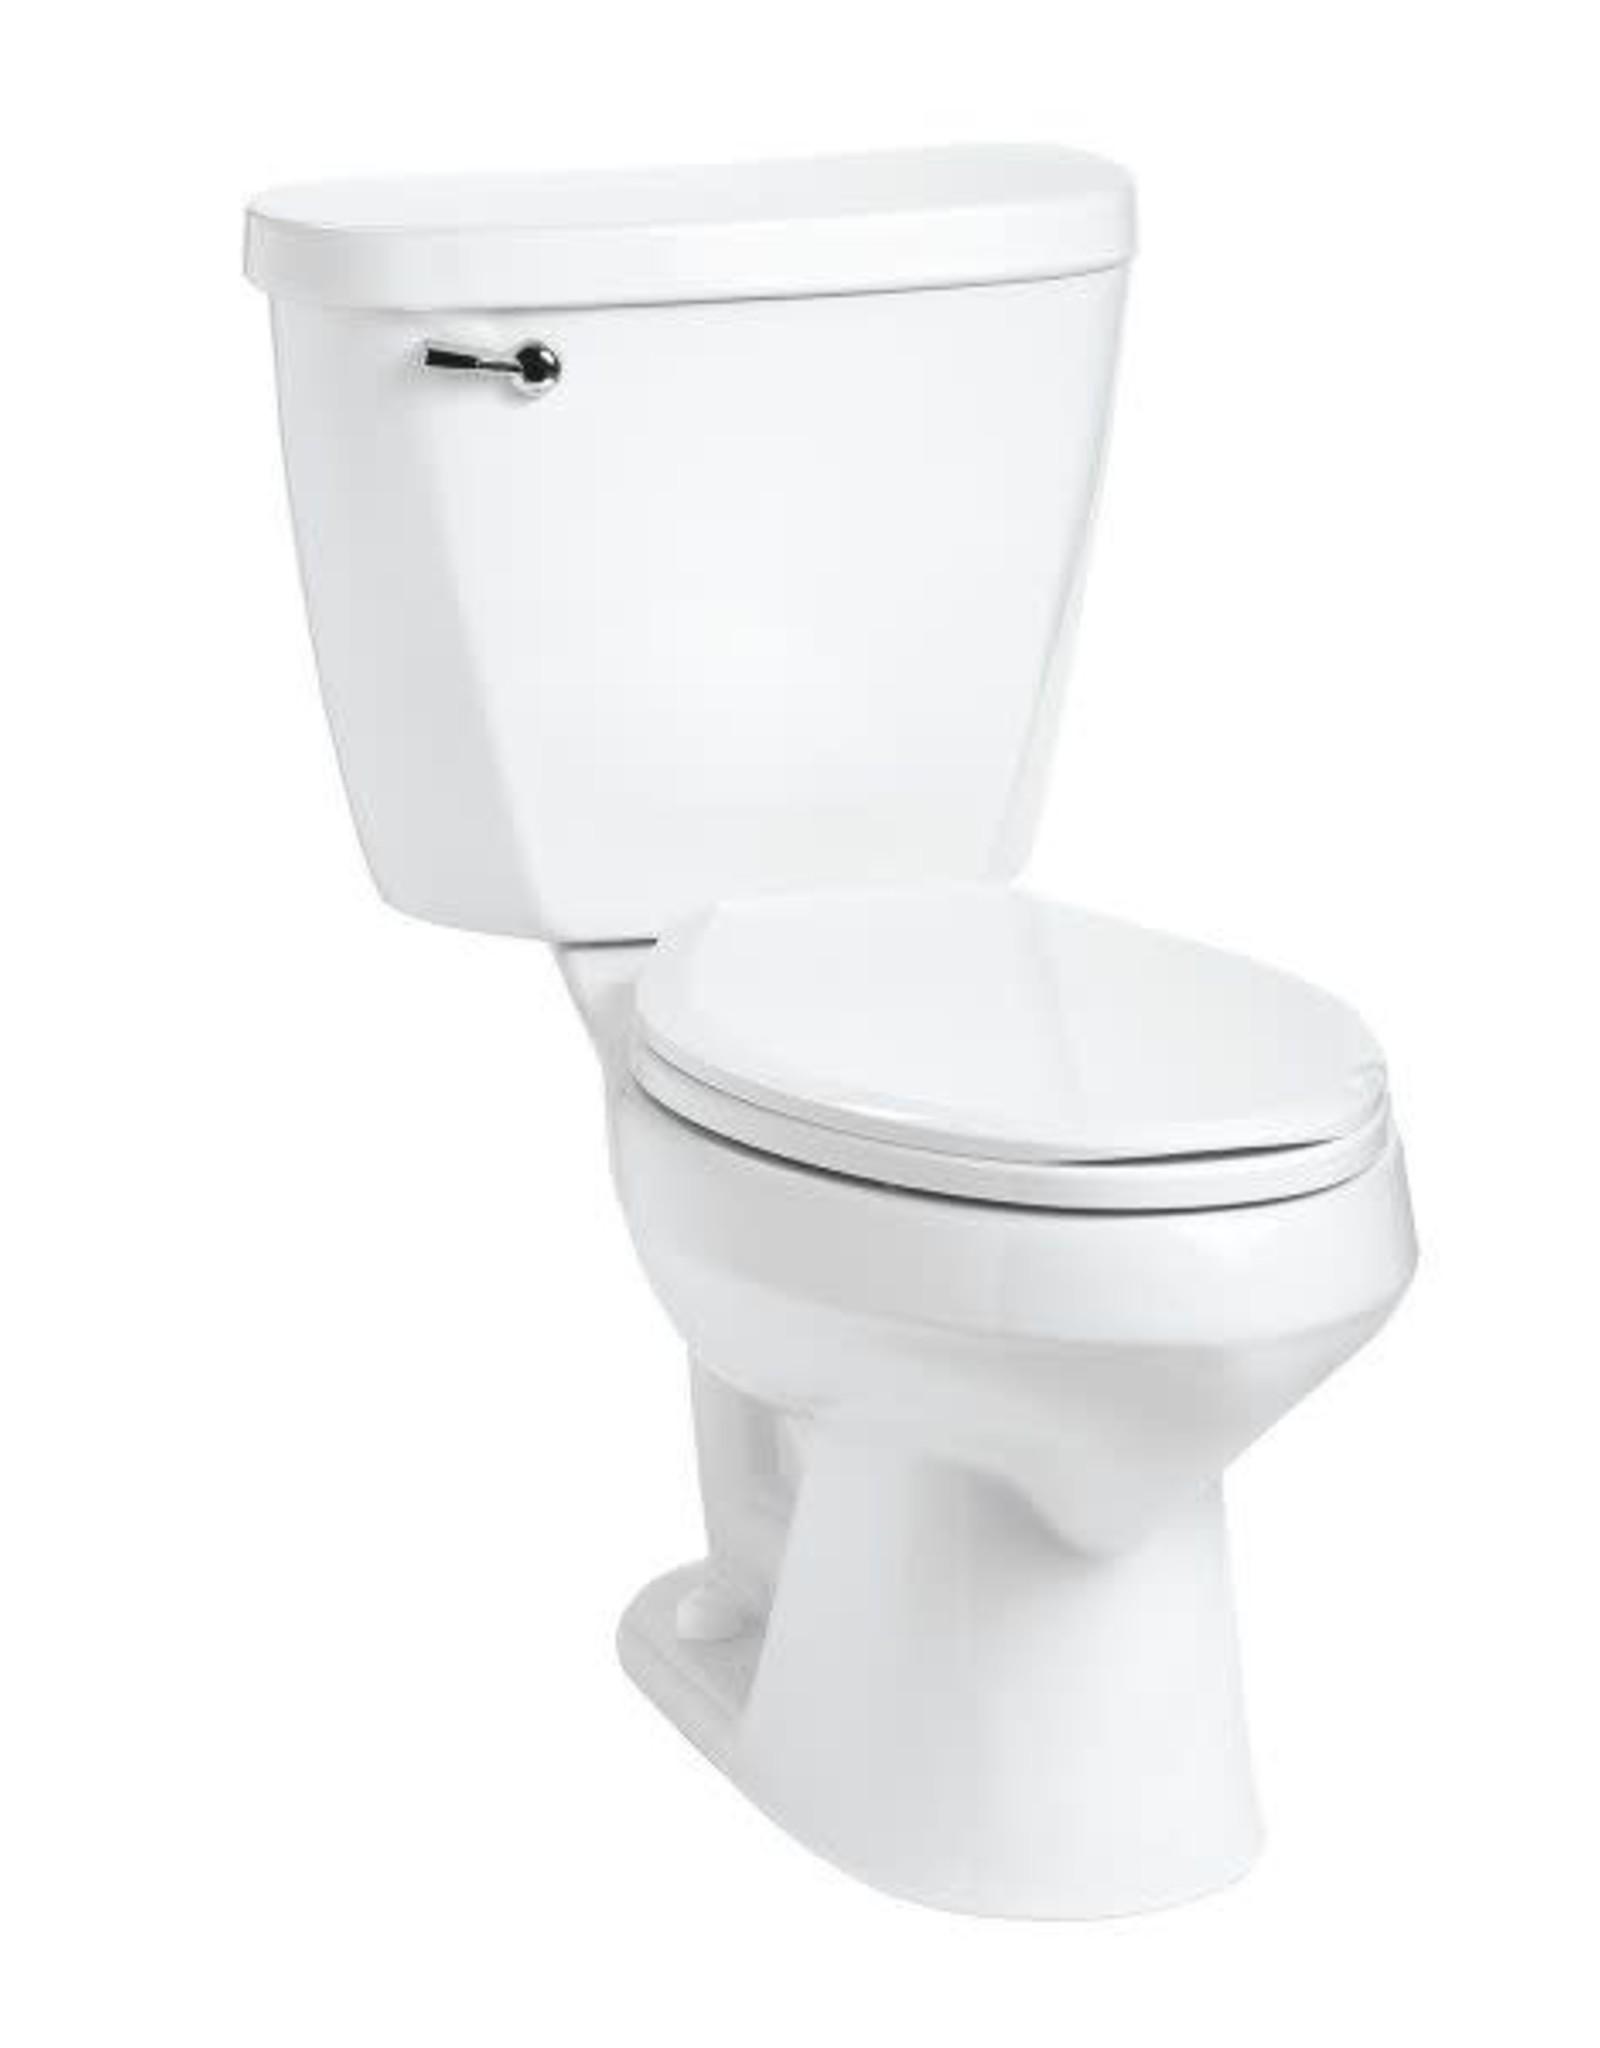 Mansfield Mansfield Summit 1.28 RH Elongated Toilet- White